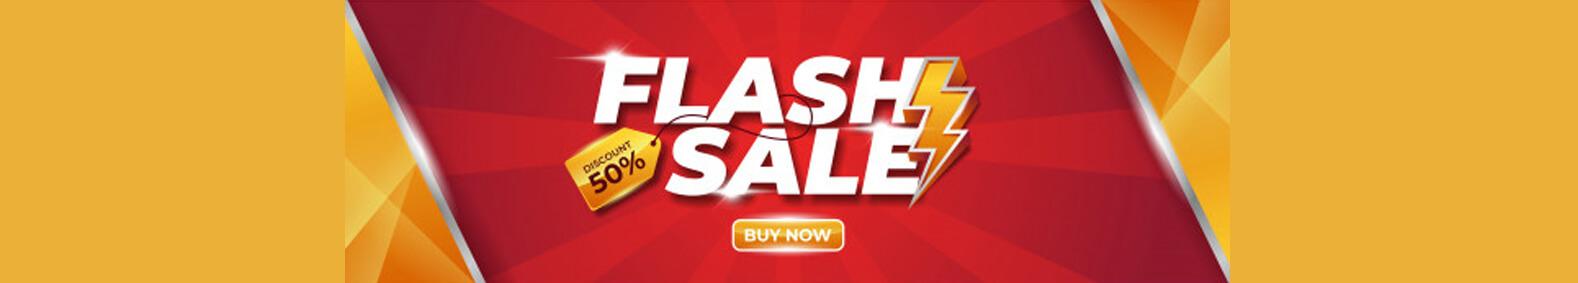 flash sale 2021 price in pakistan cookingorbit pk